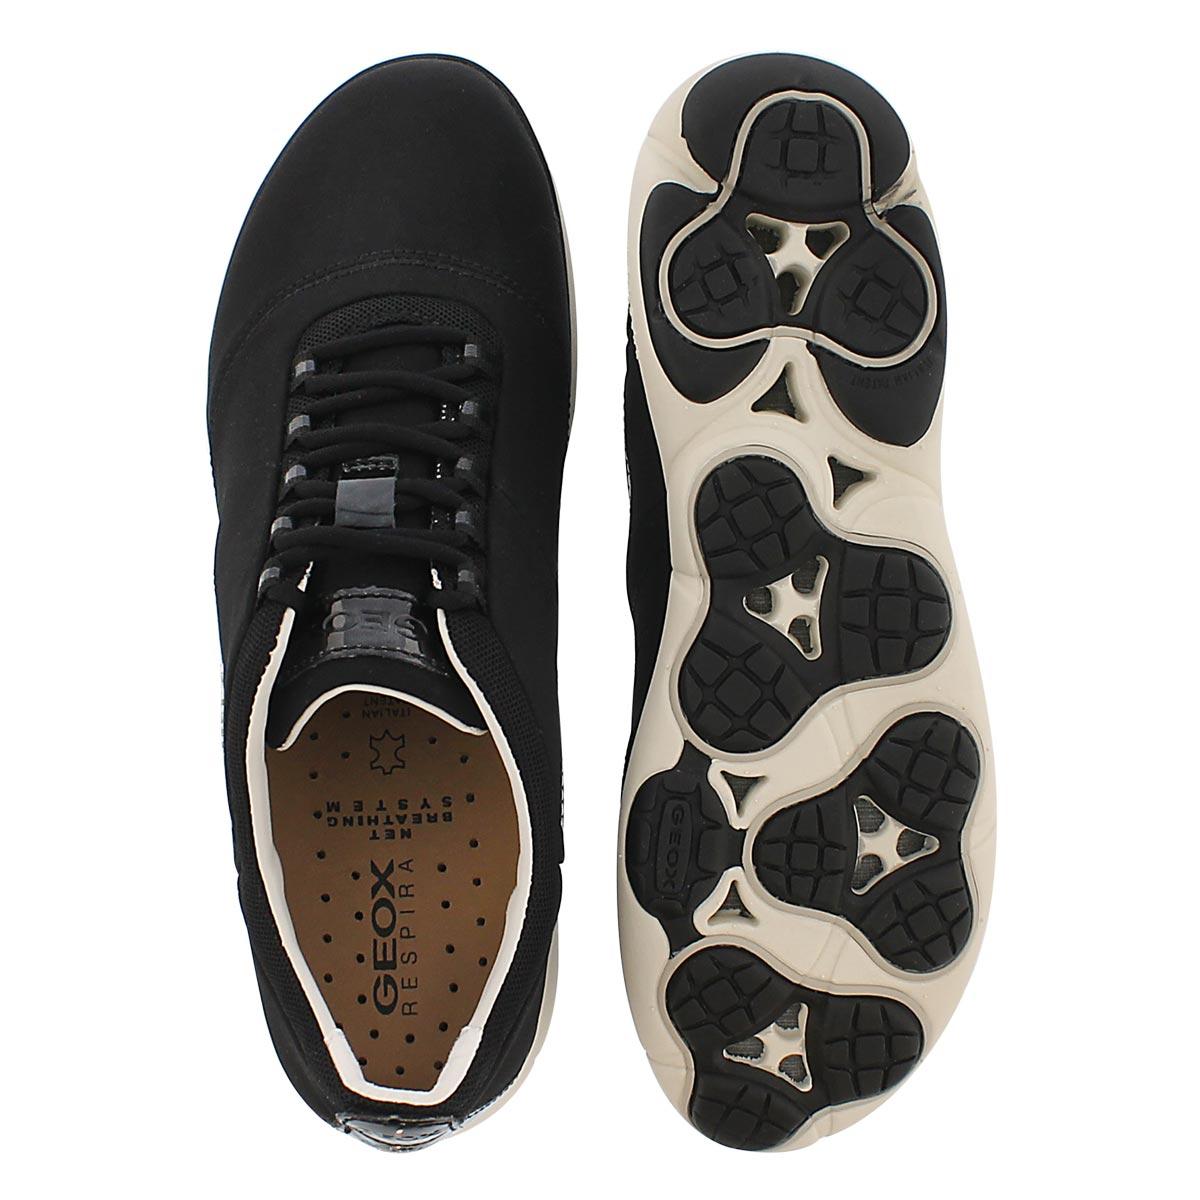 Lds Nebula black running shoe